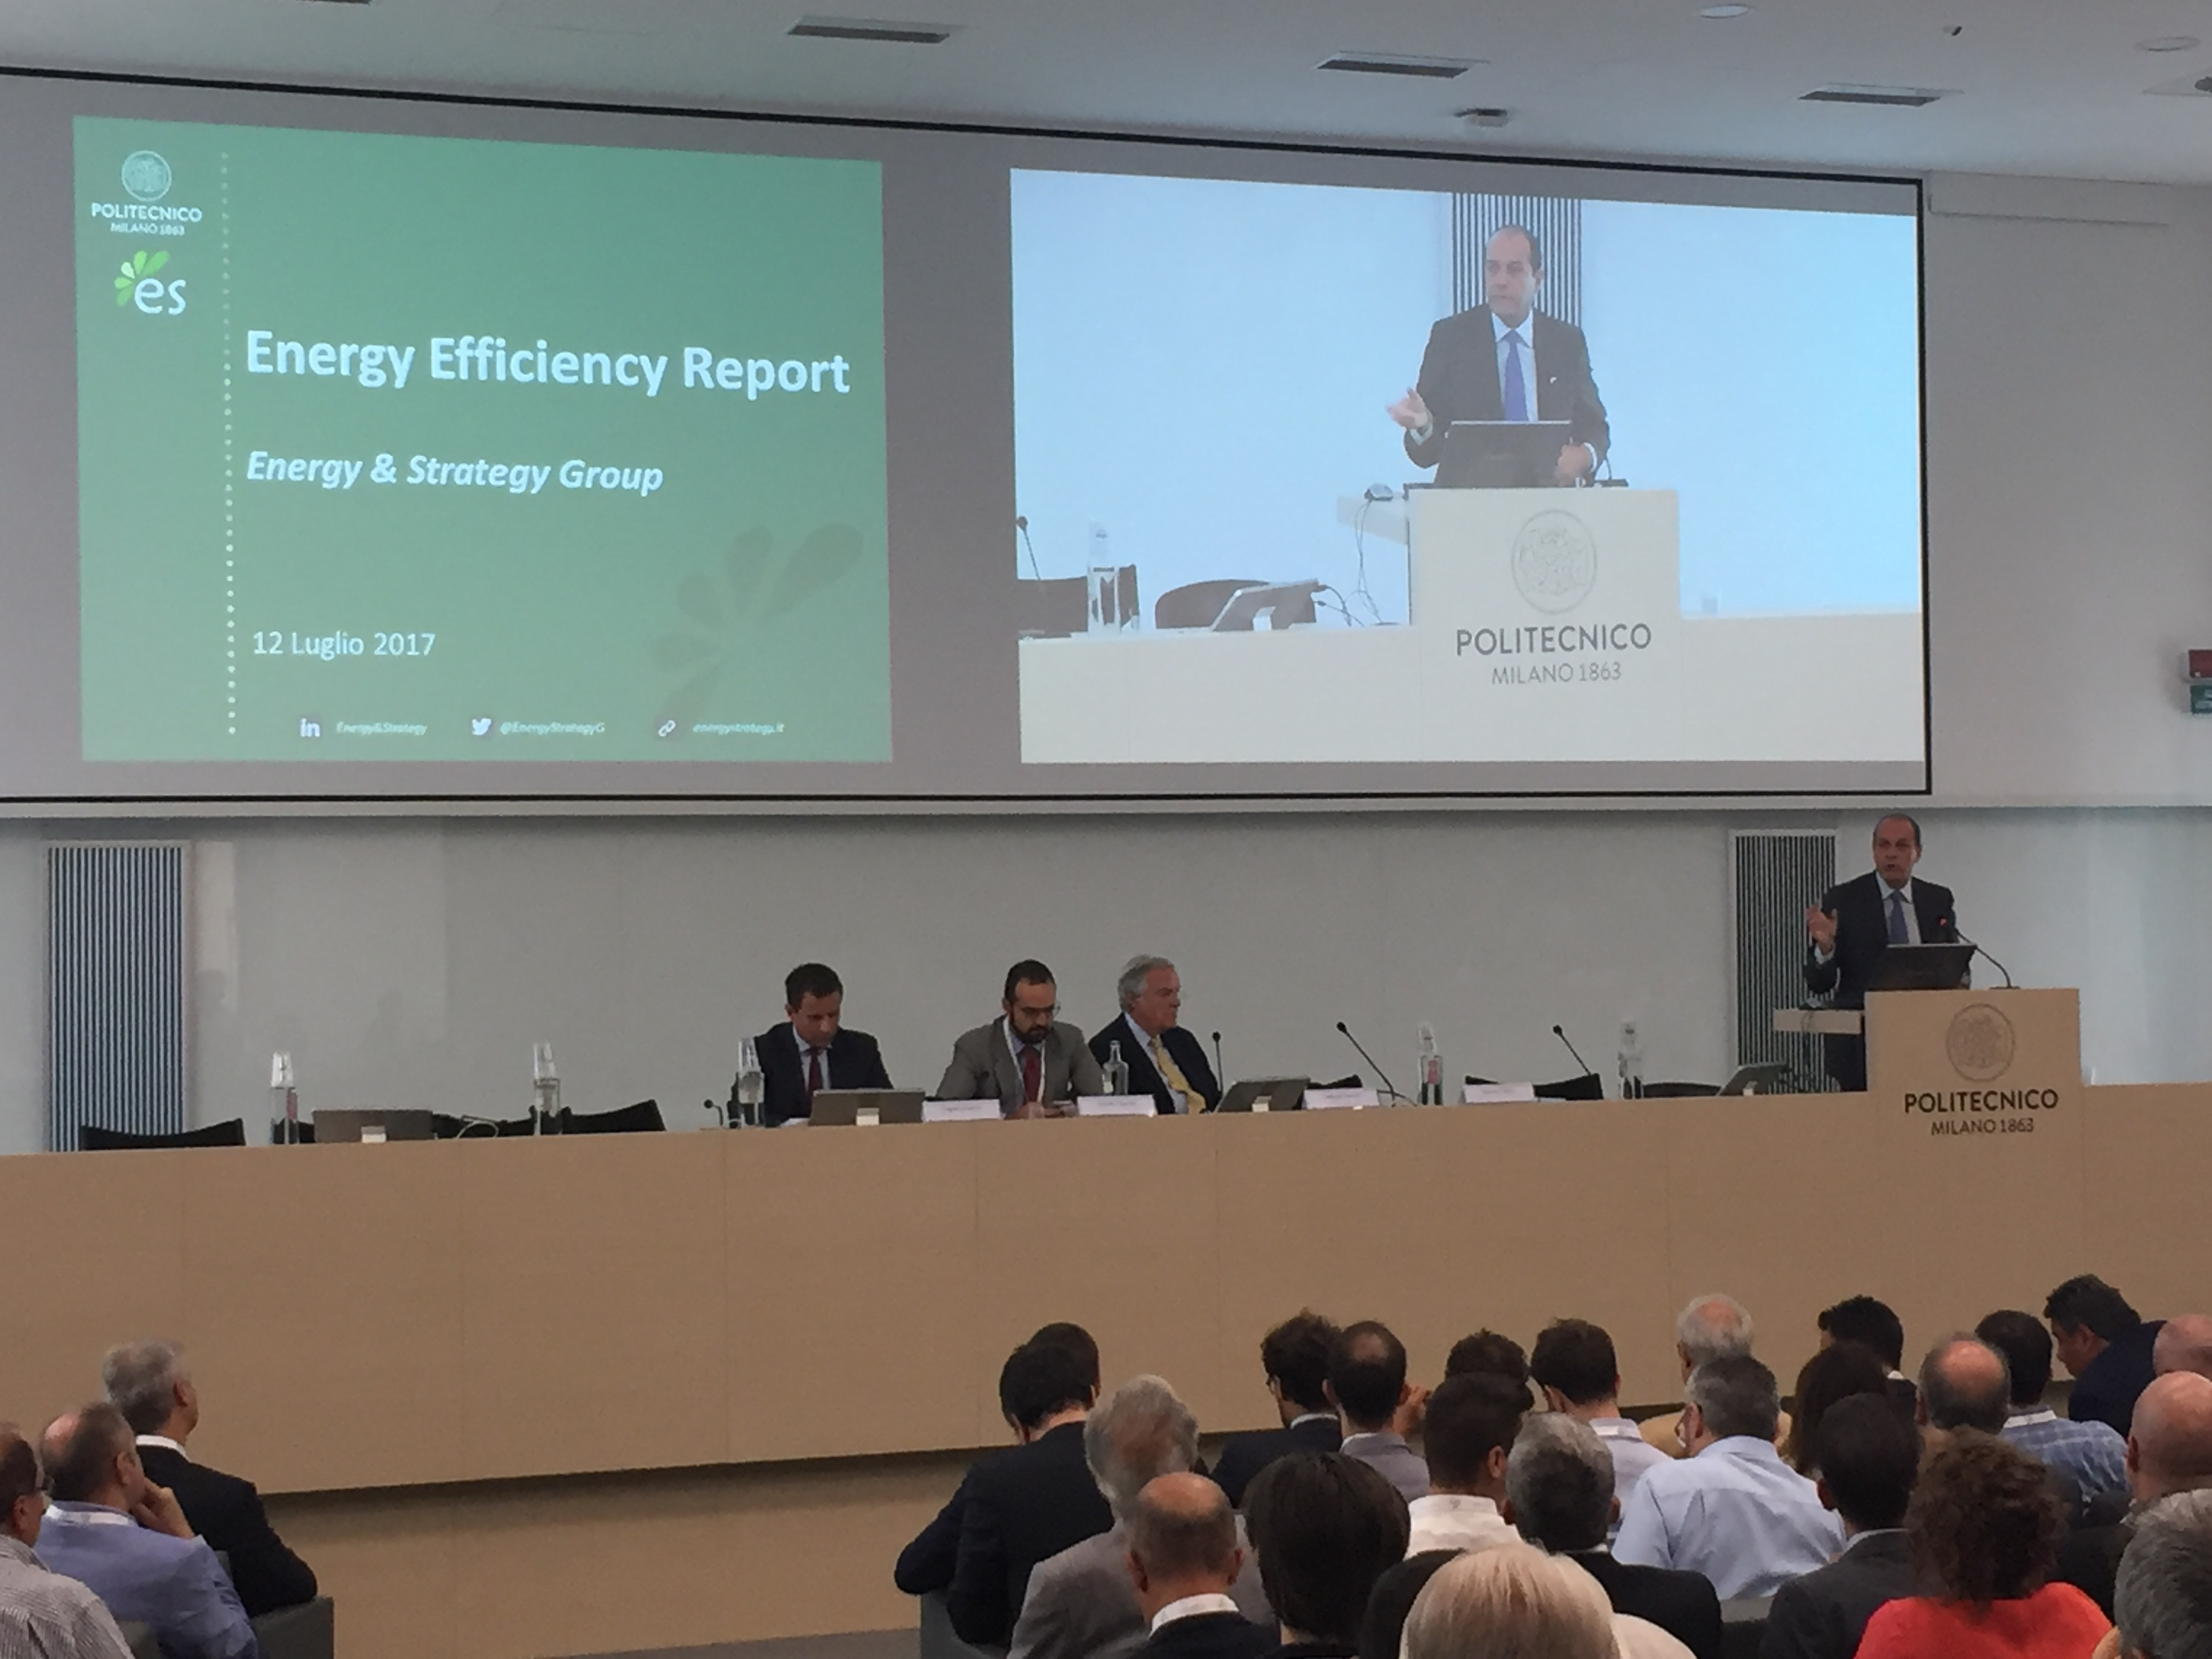 energyefficiencyreport.jpg